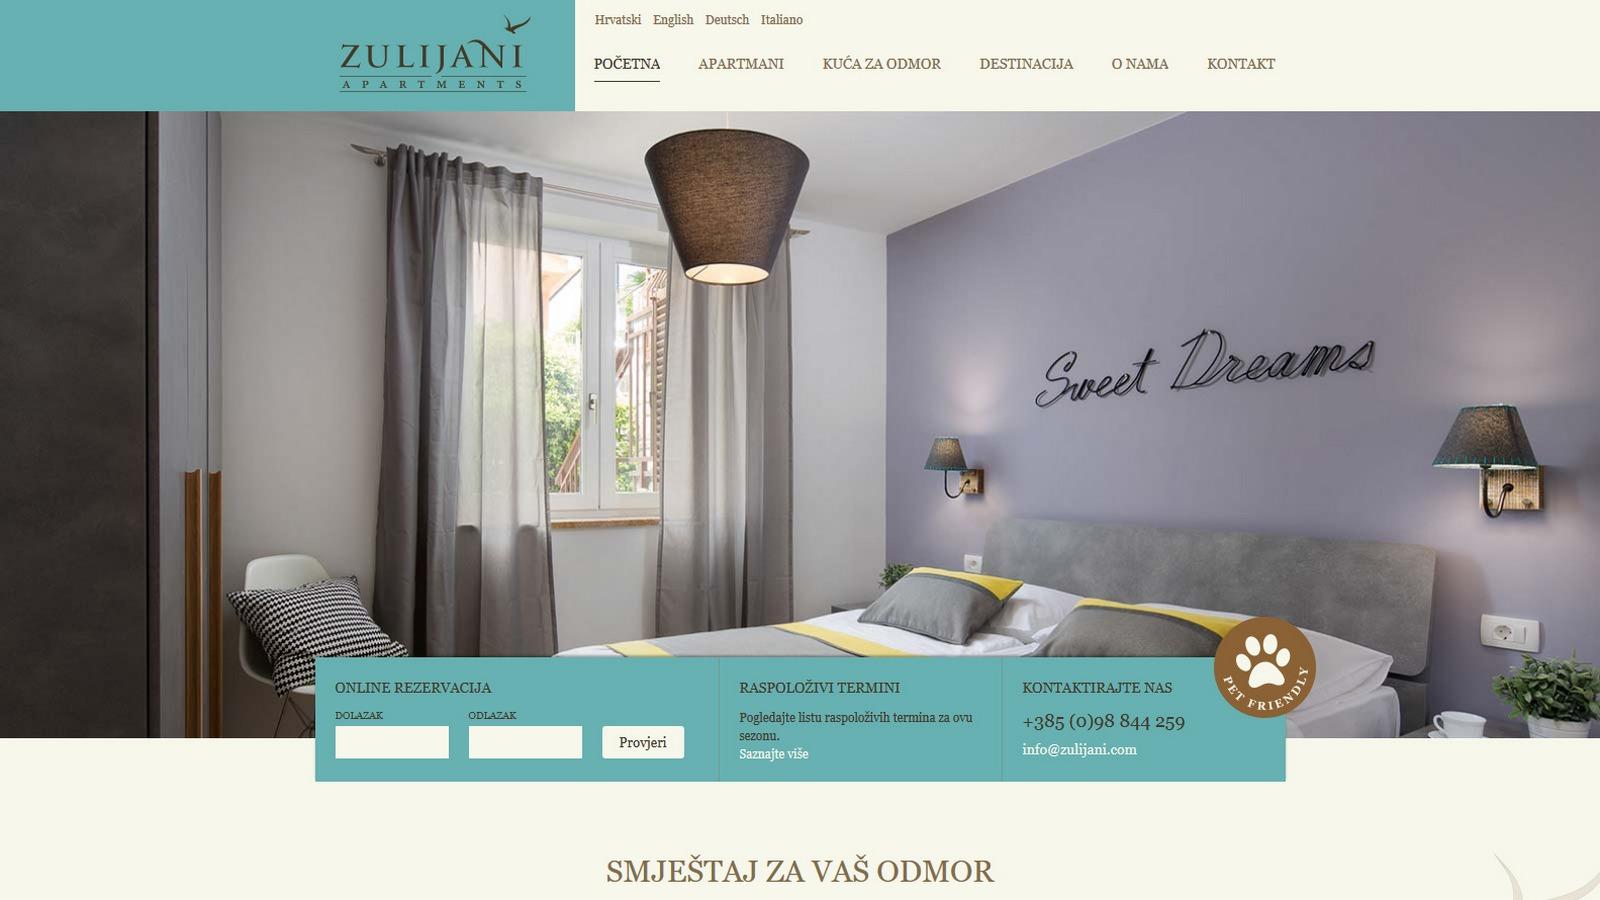 Zulijani apartmani